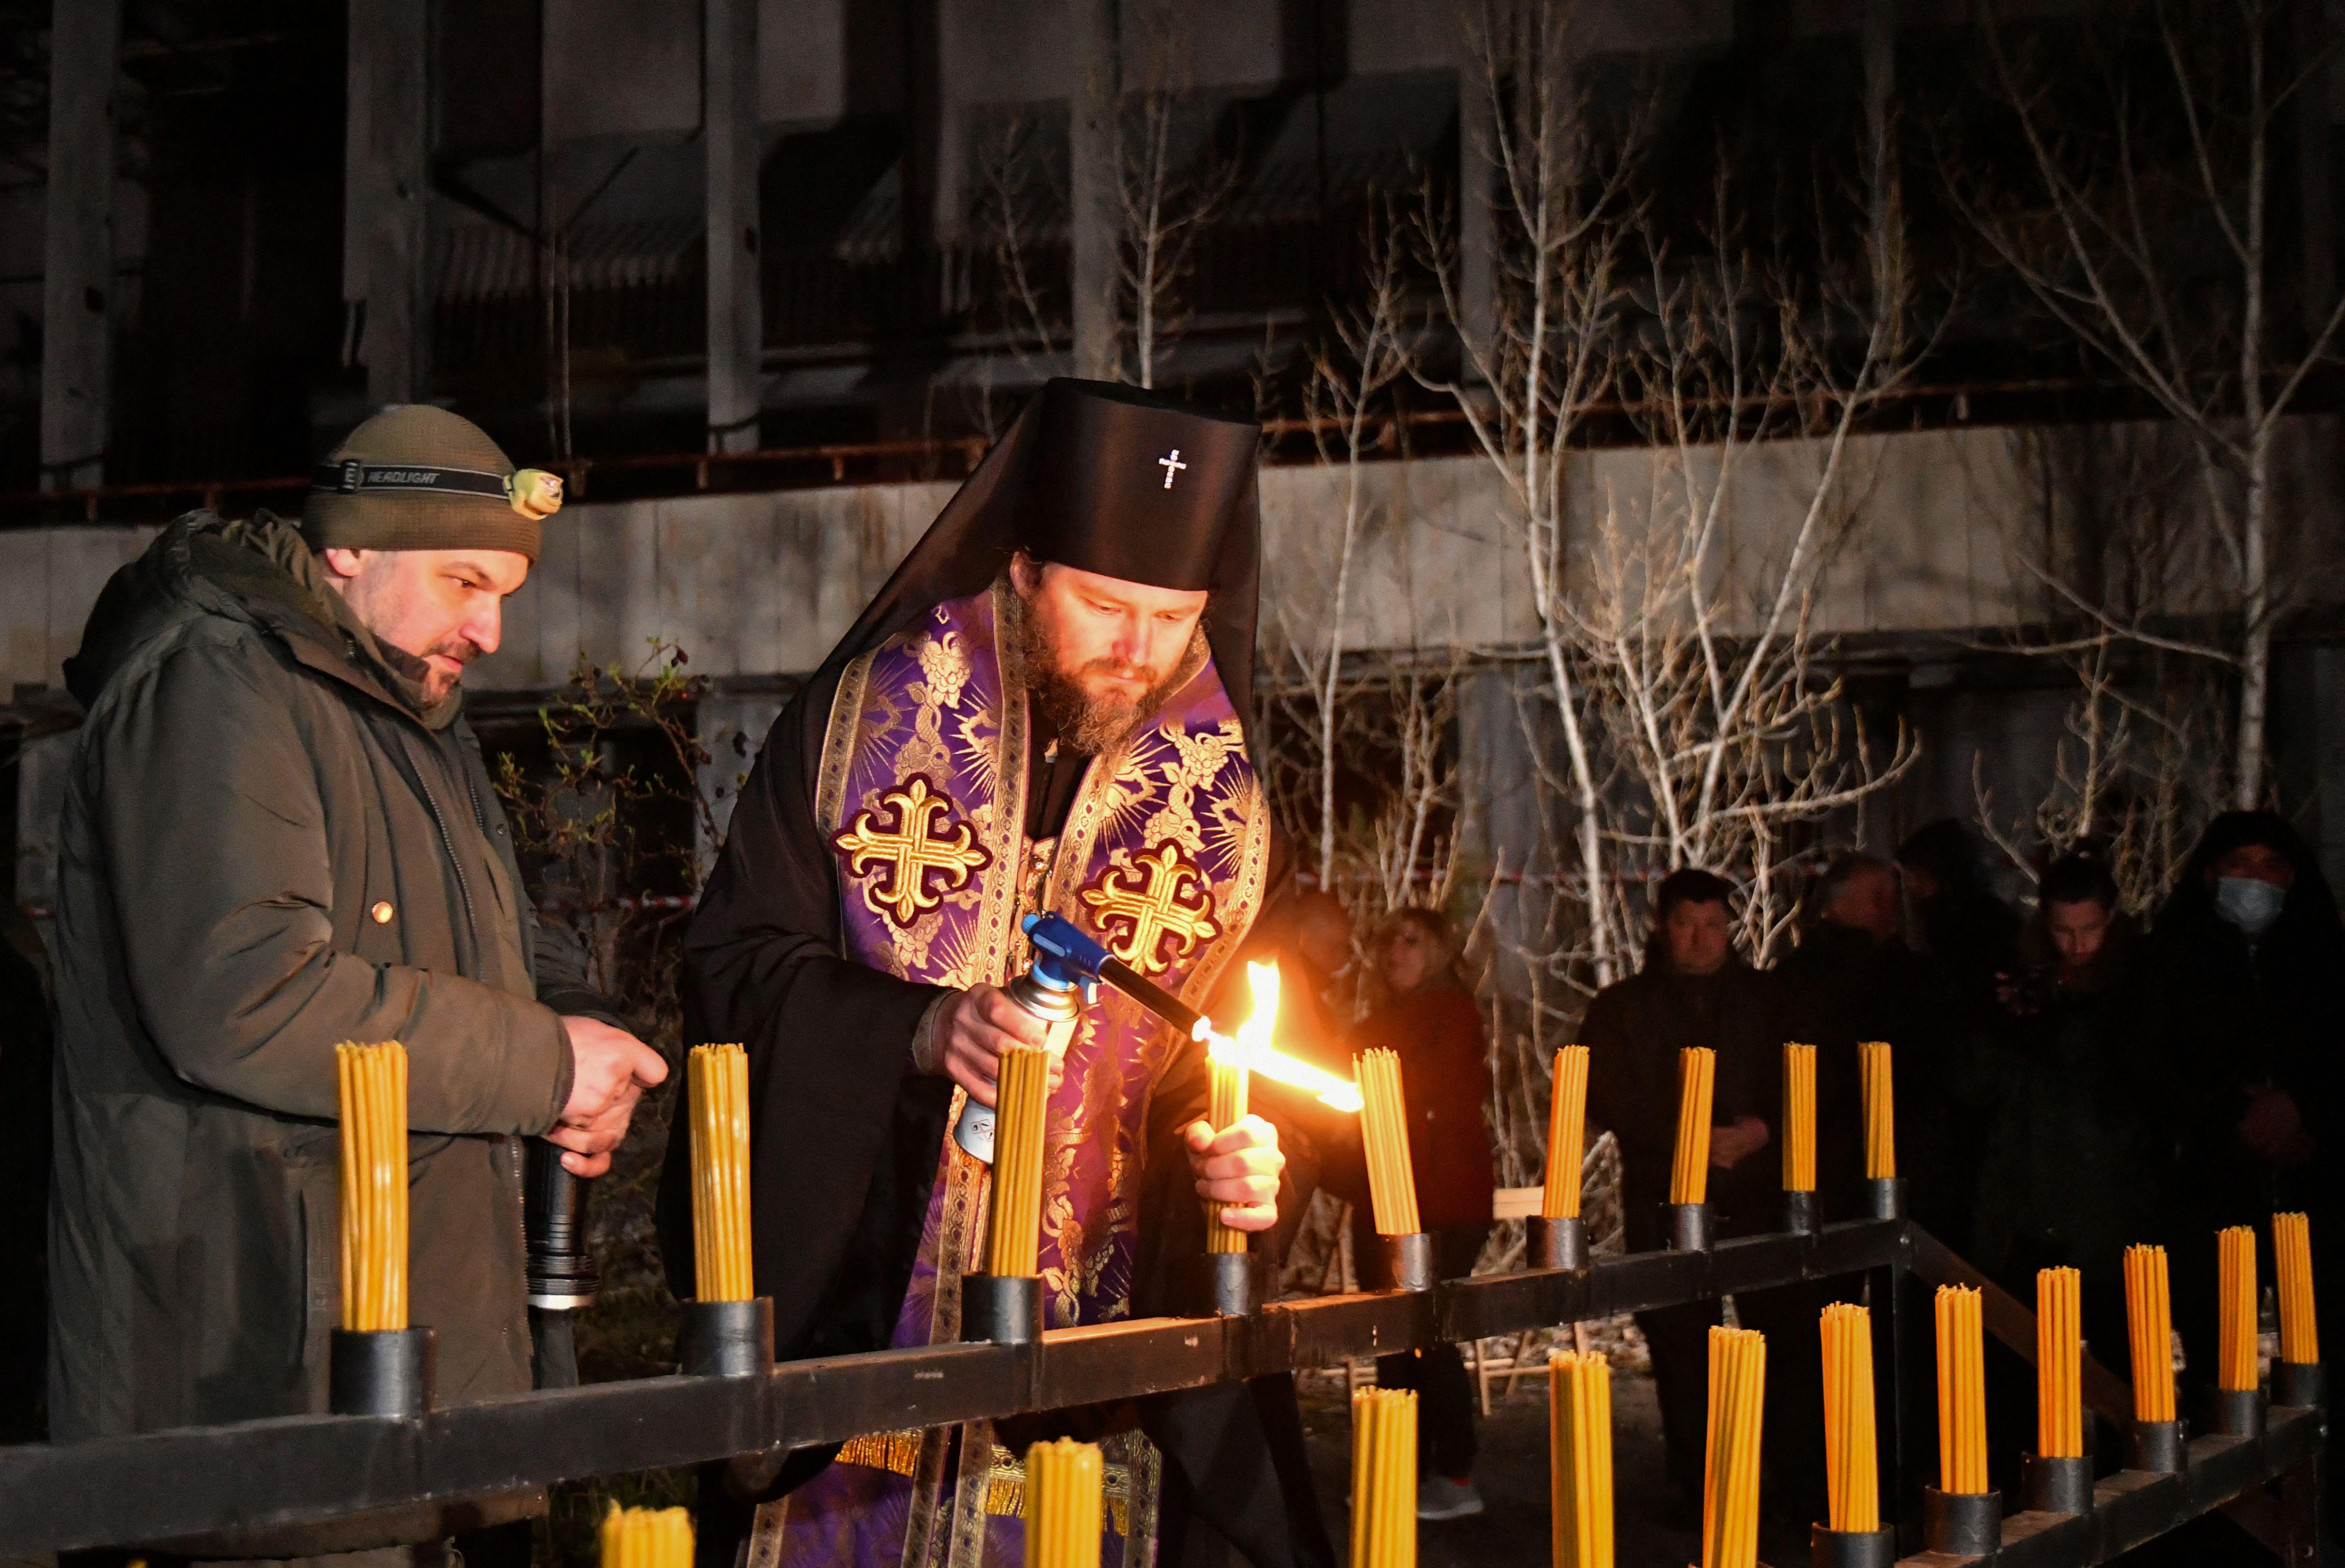 Pendeta ortodoks menyalakan lilin di alun-alun pusat kota Pripyat, tak jauh dari Pembangkit Listrik Tenaga Nuklir Chernobyl, pada 26 April 2021. Mereka mengadakan acara peringatan 35 tahun bencana Chernobyl. Foto: Genya Savilov/AFP